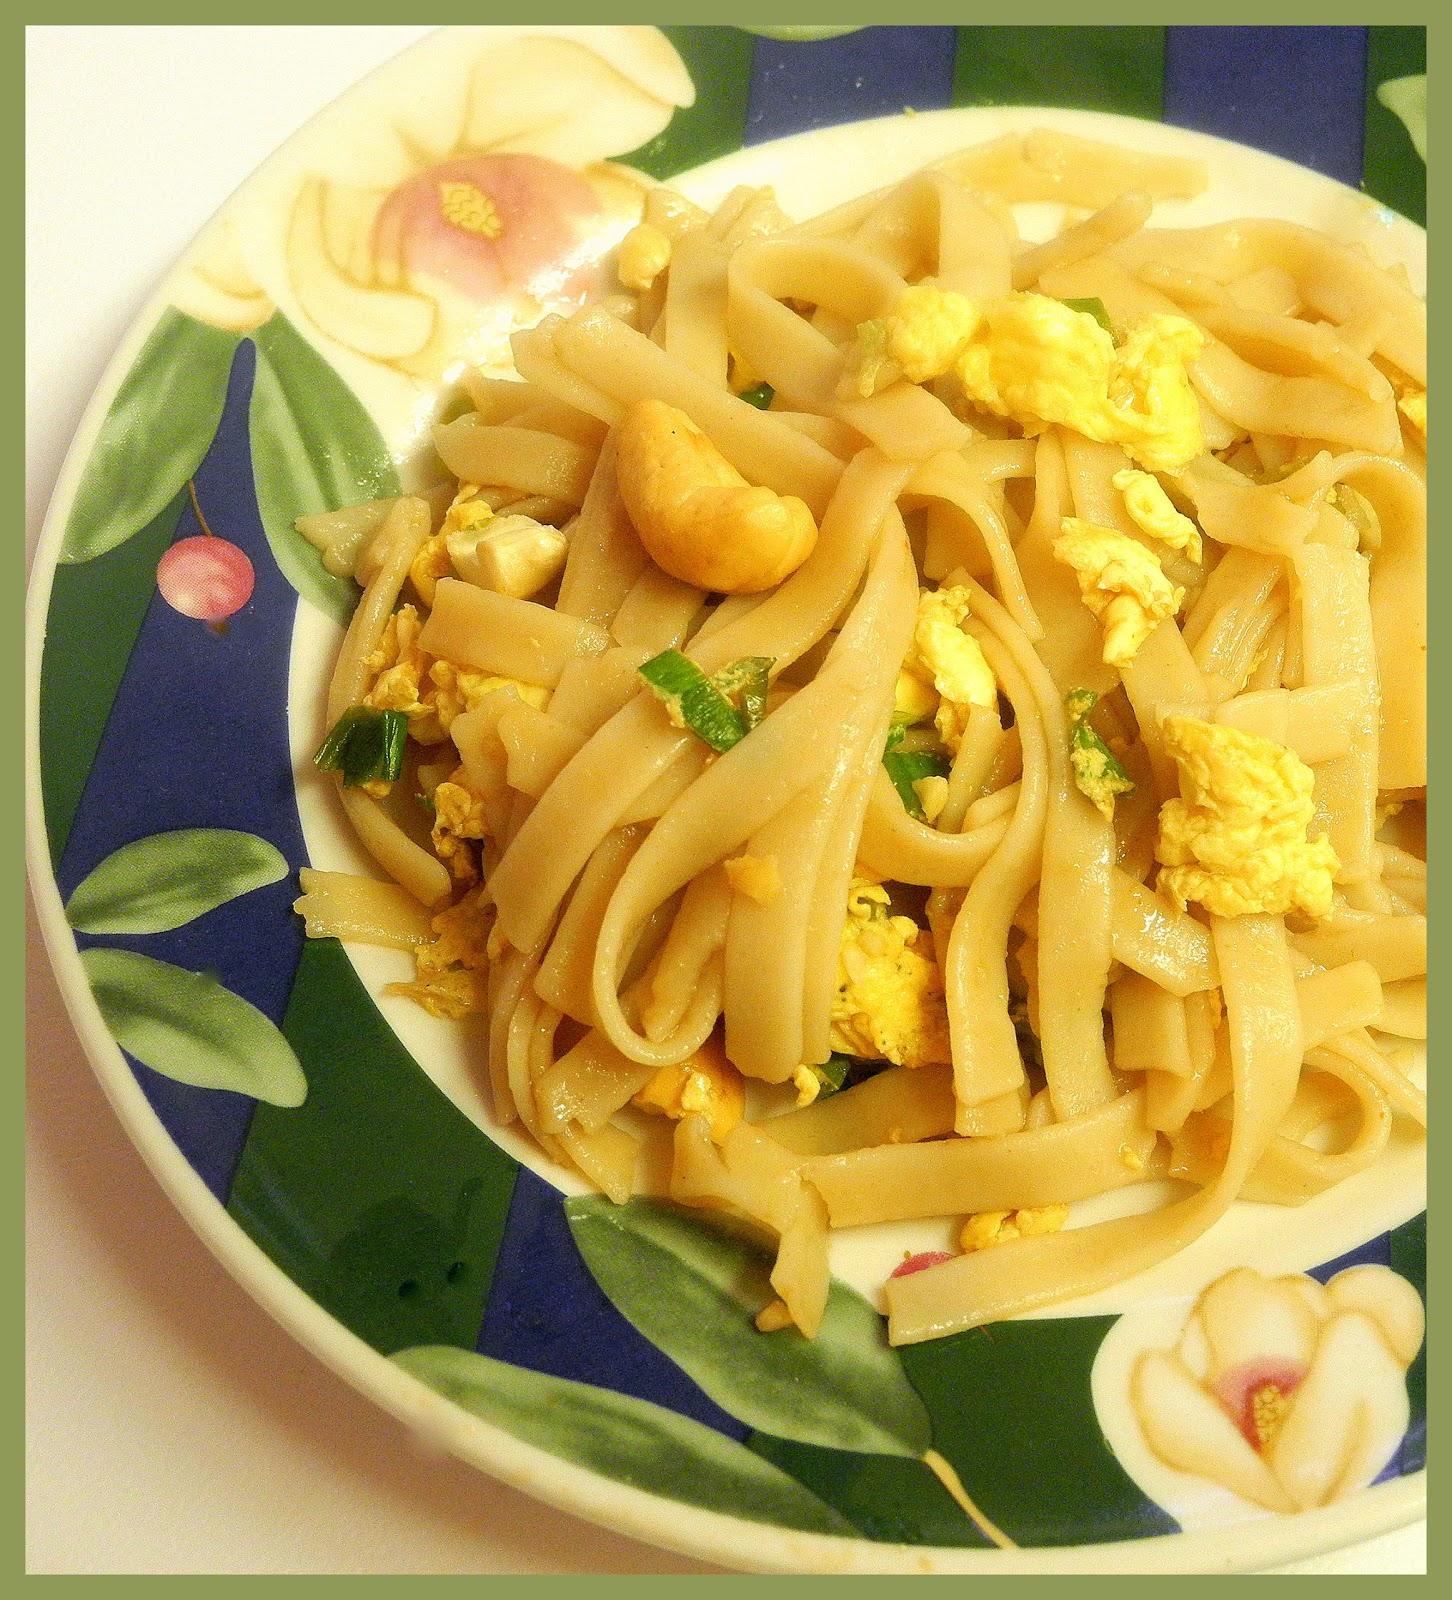 BIZZY BAKES: Vegetable Pad Thai